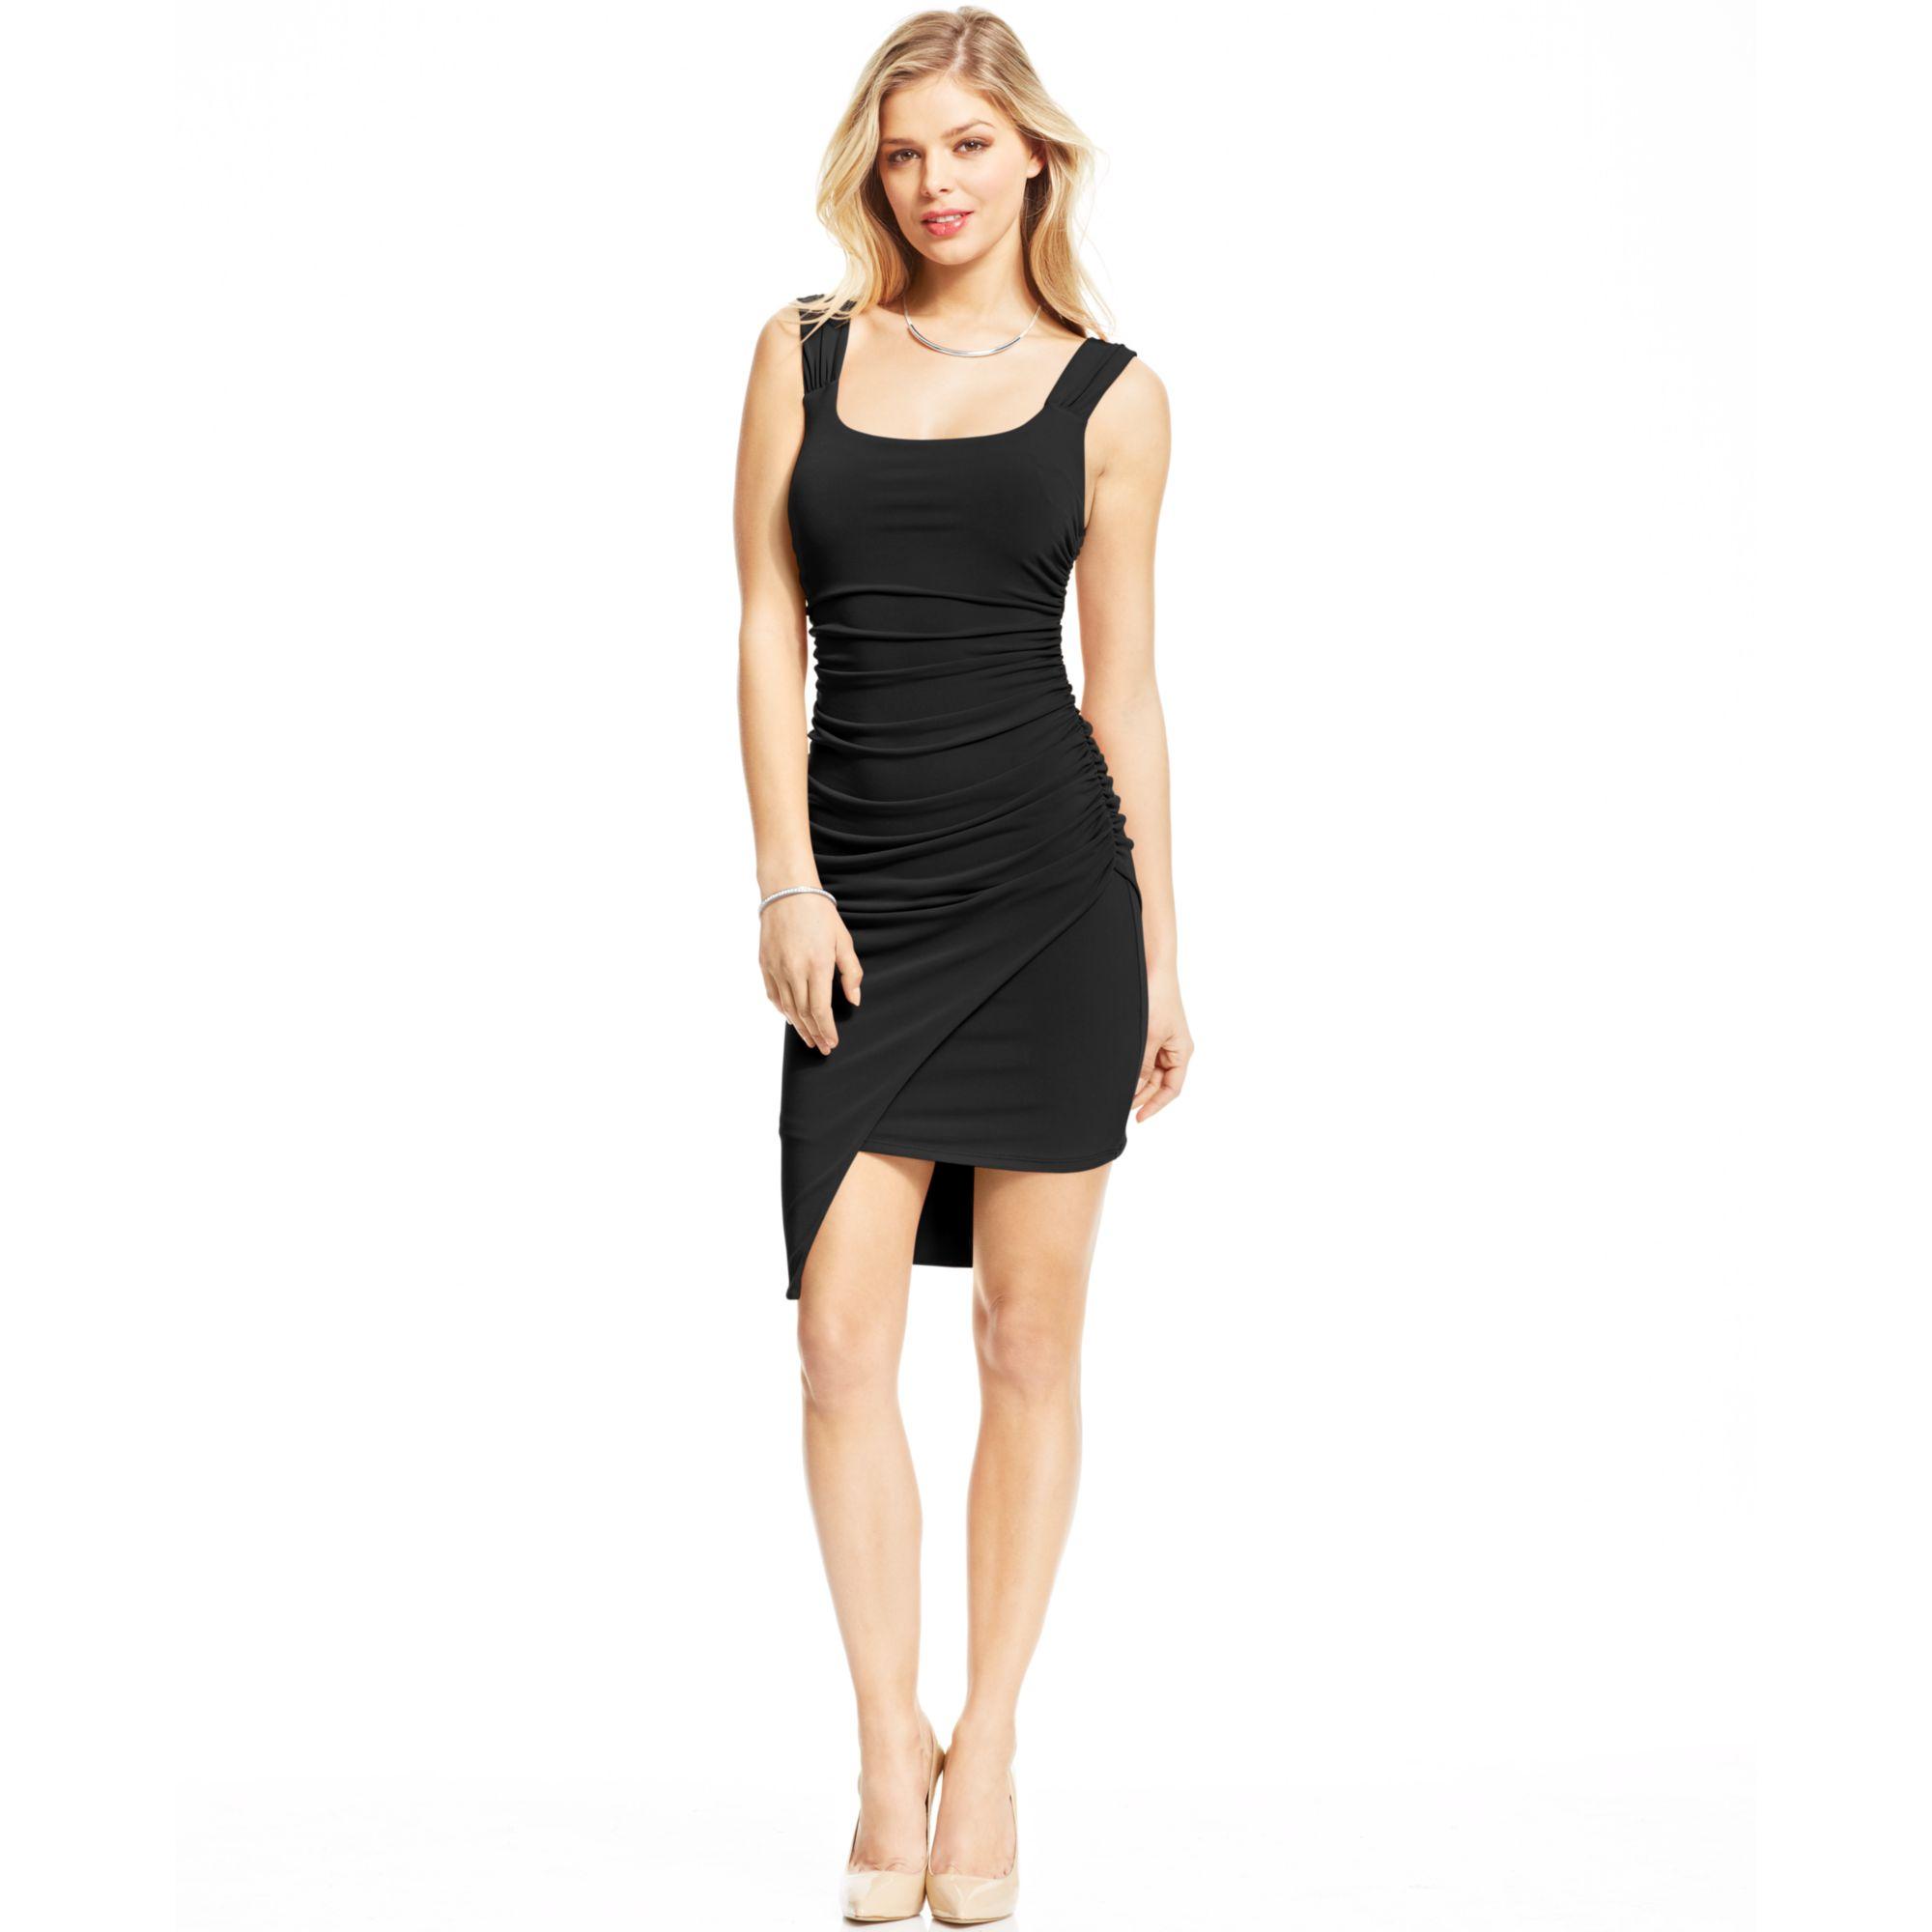 macys black dresses photo - 1